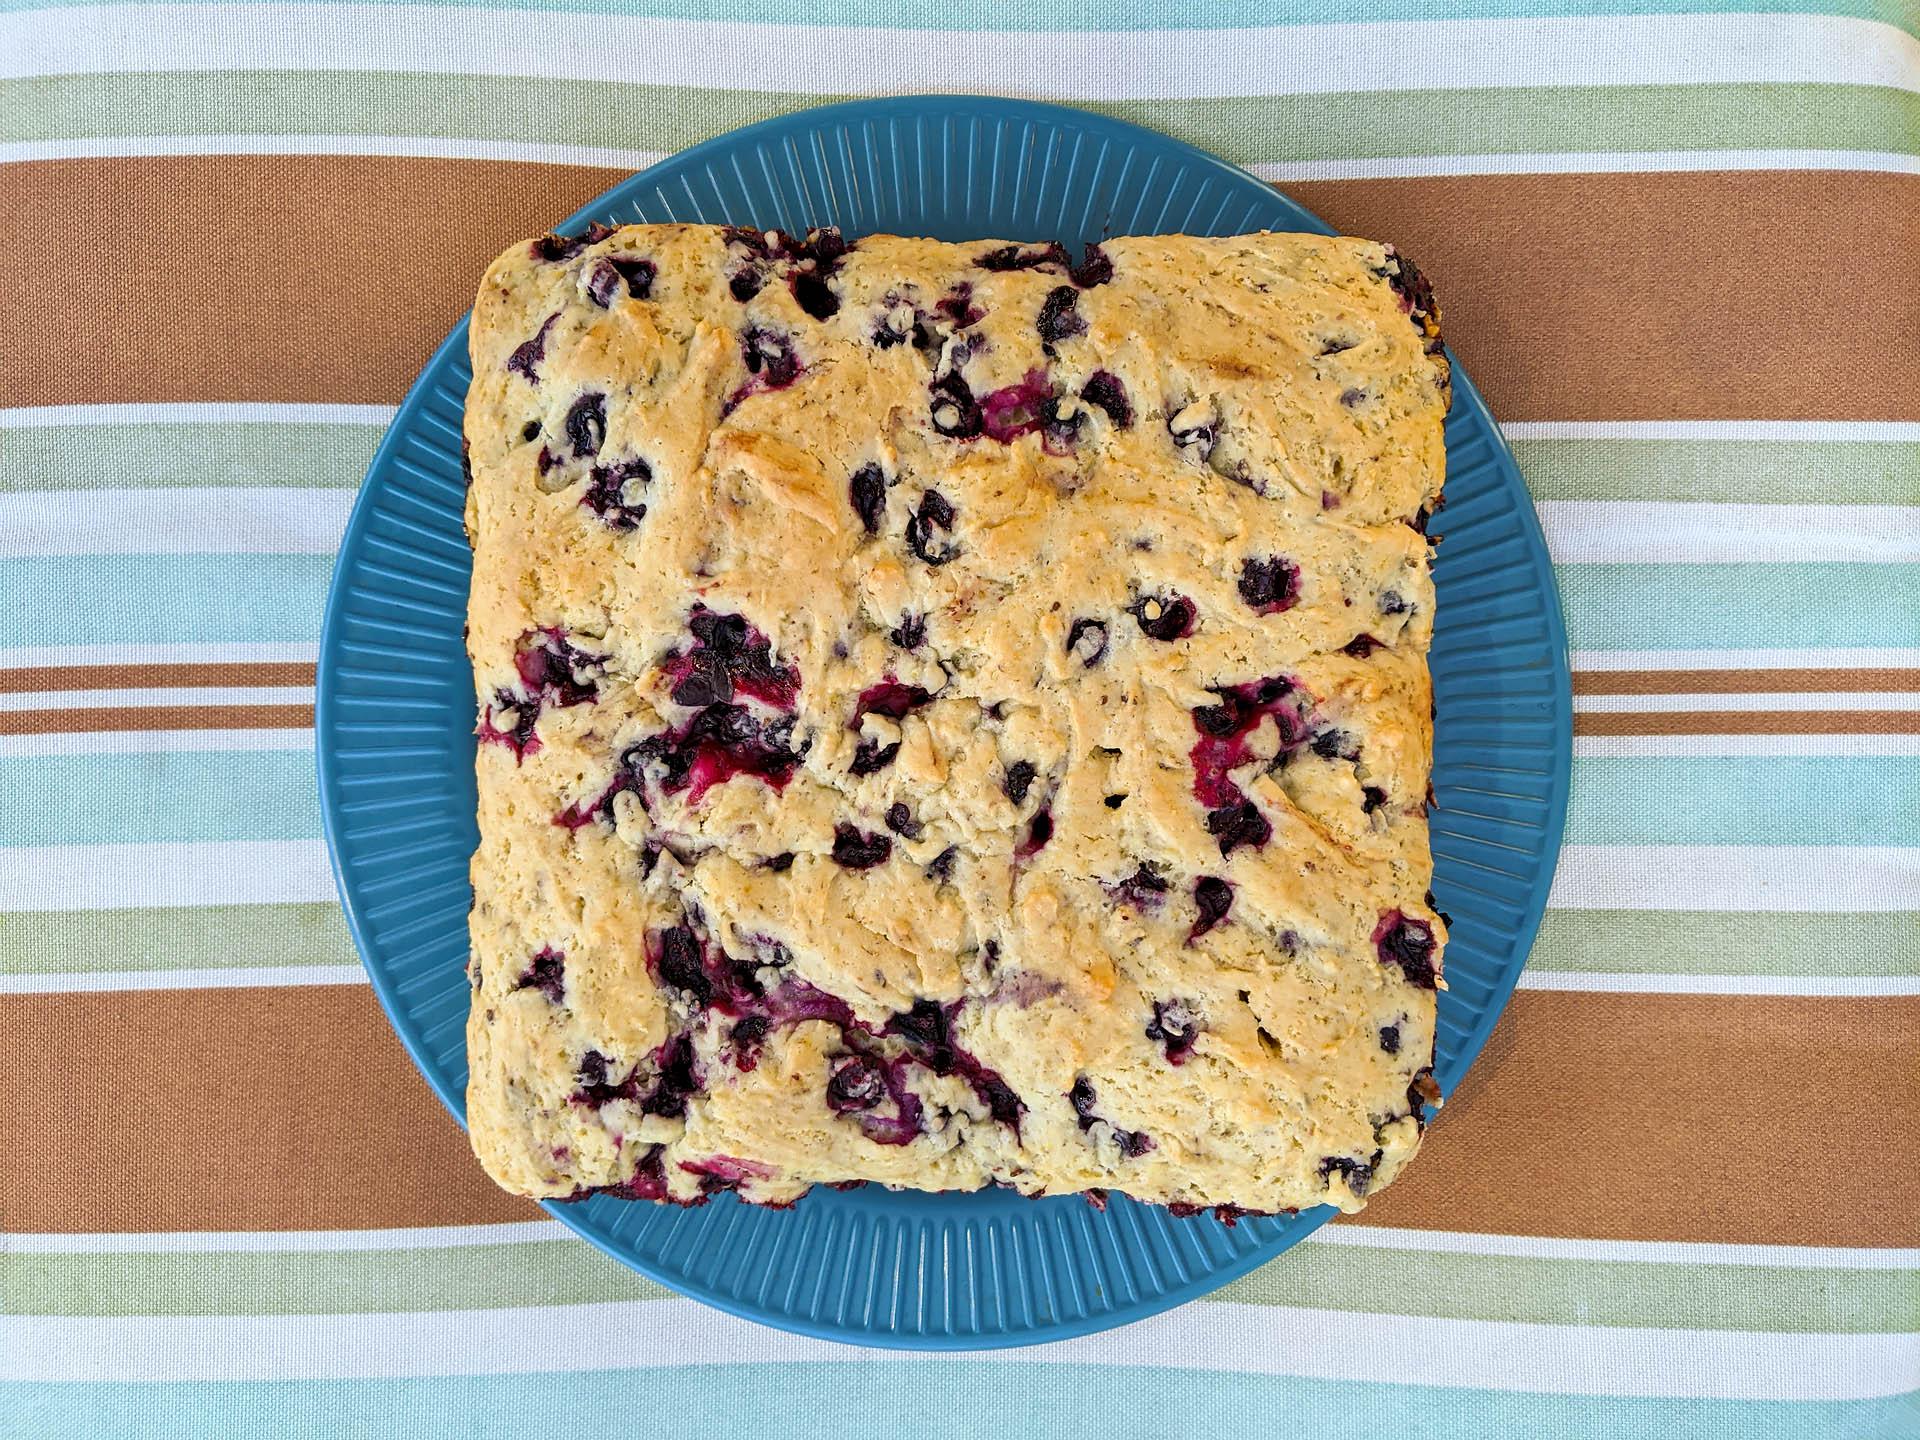 Huckleberry cake